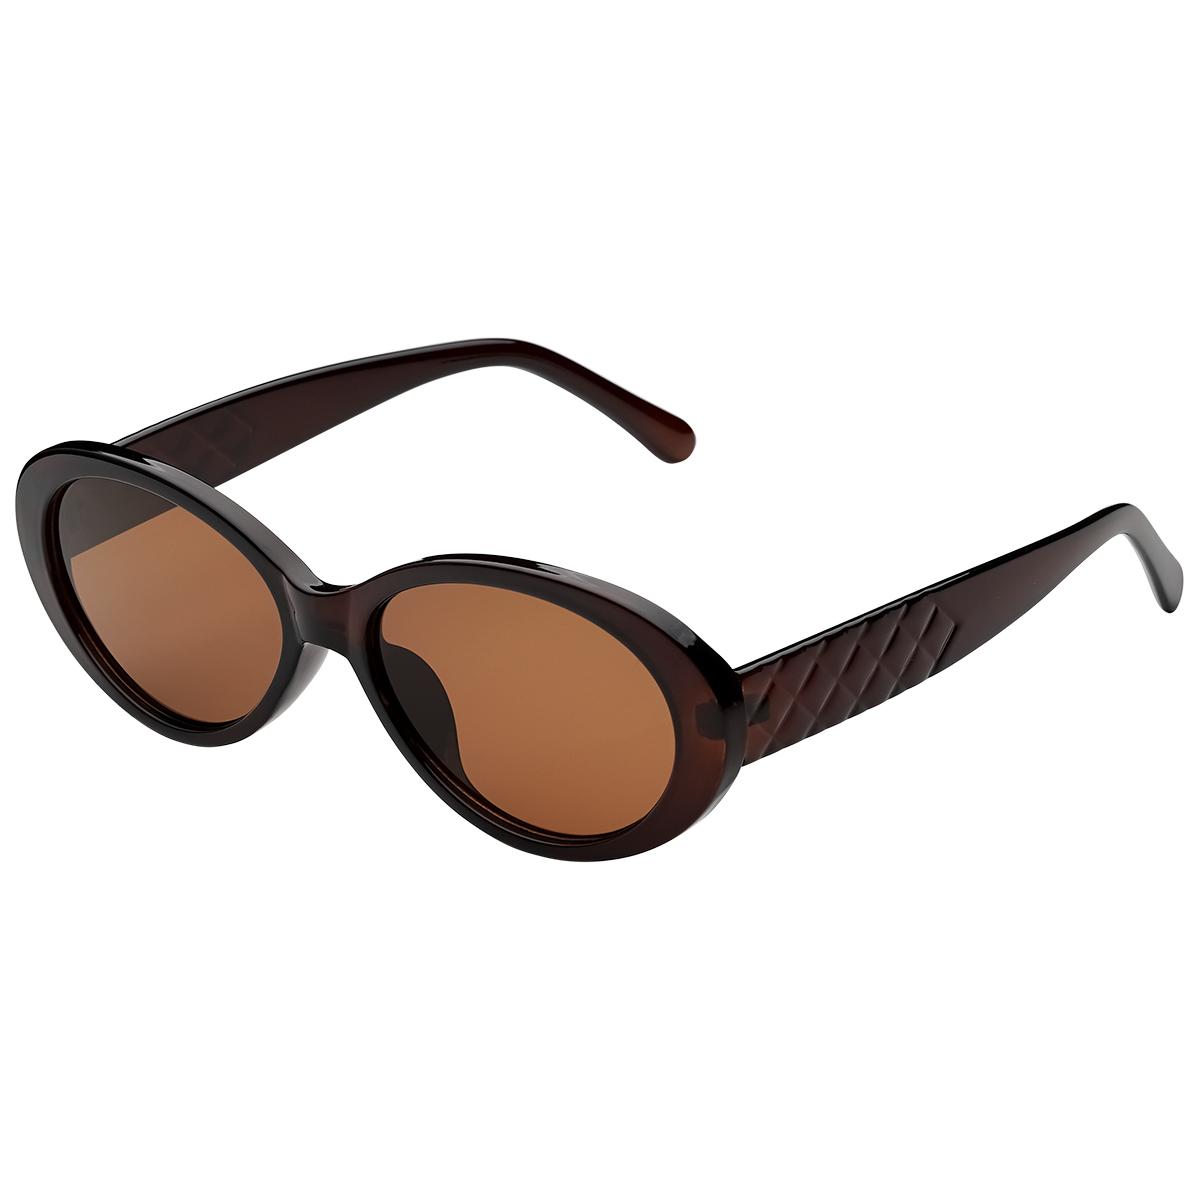 Gafas de sol ovaladas